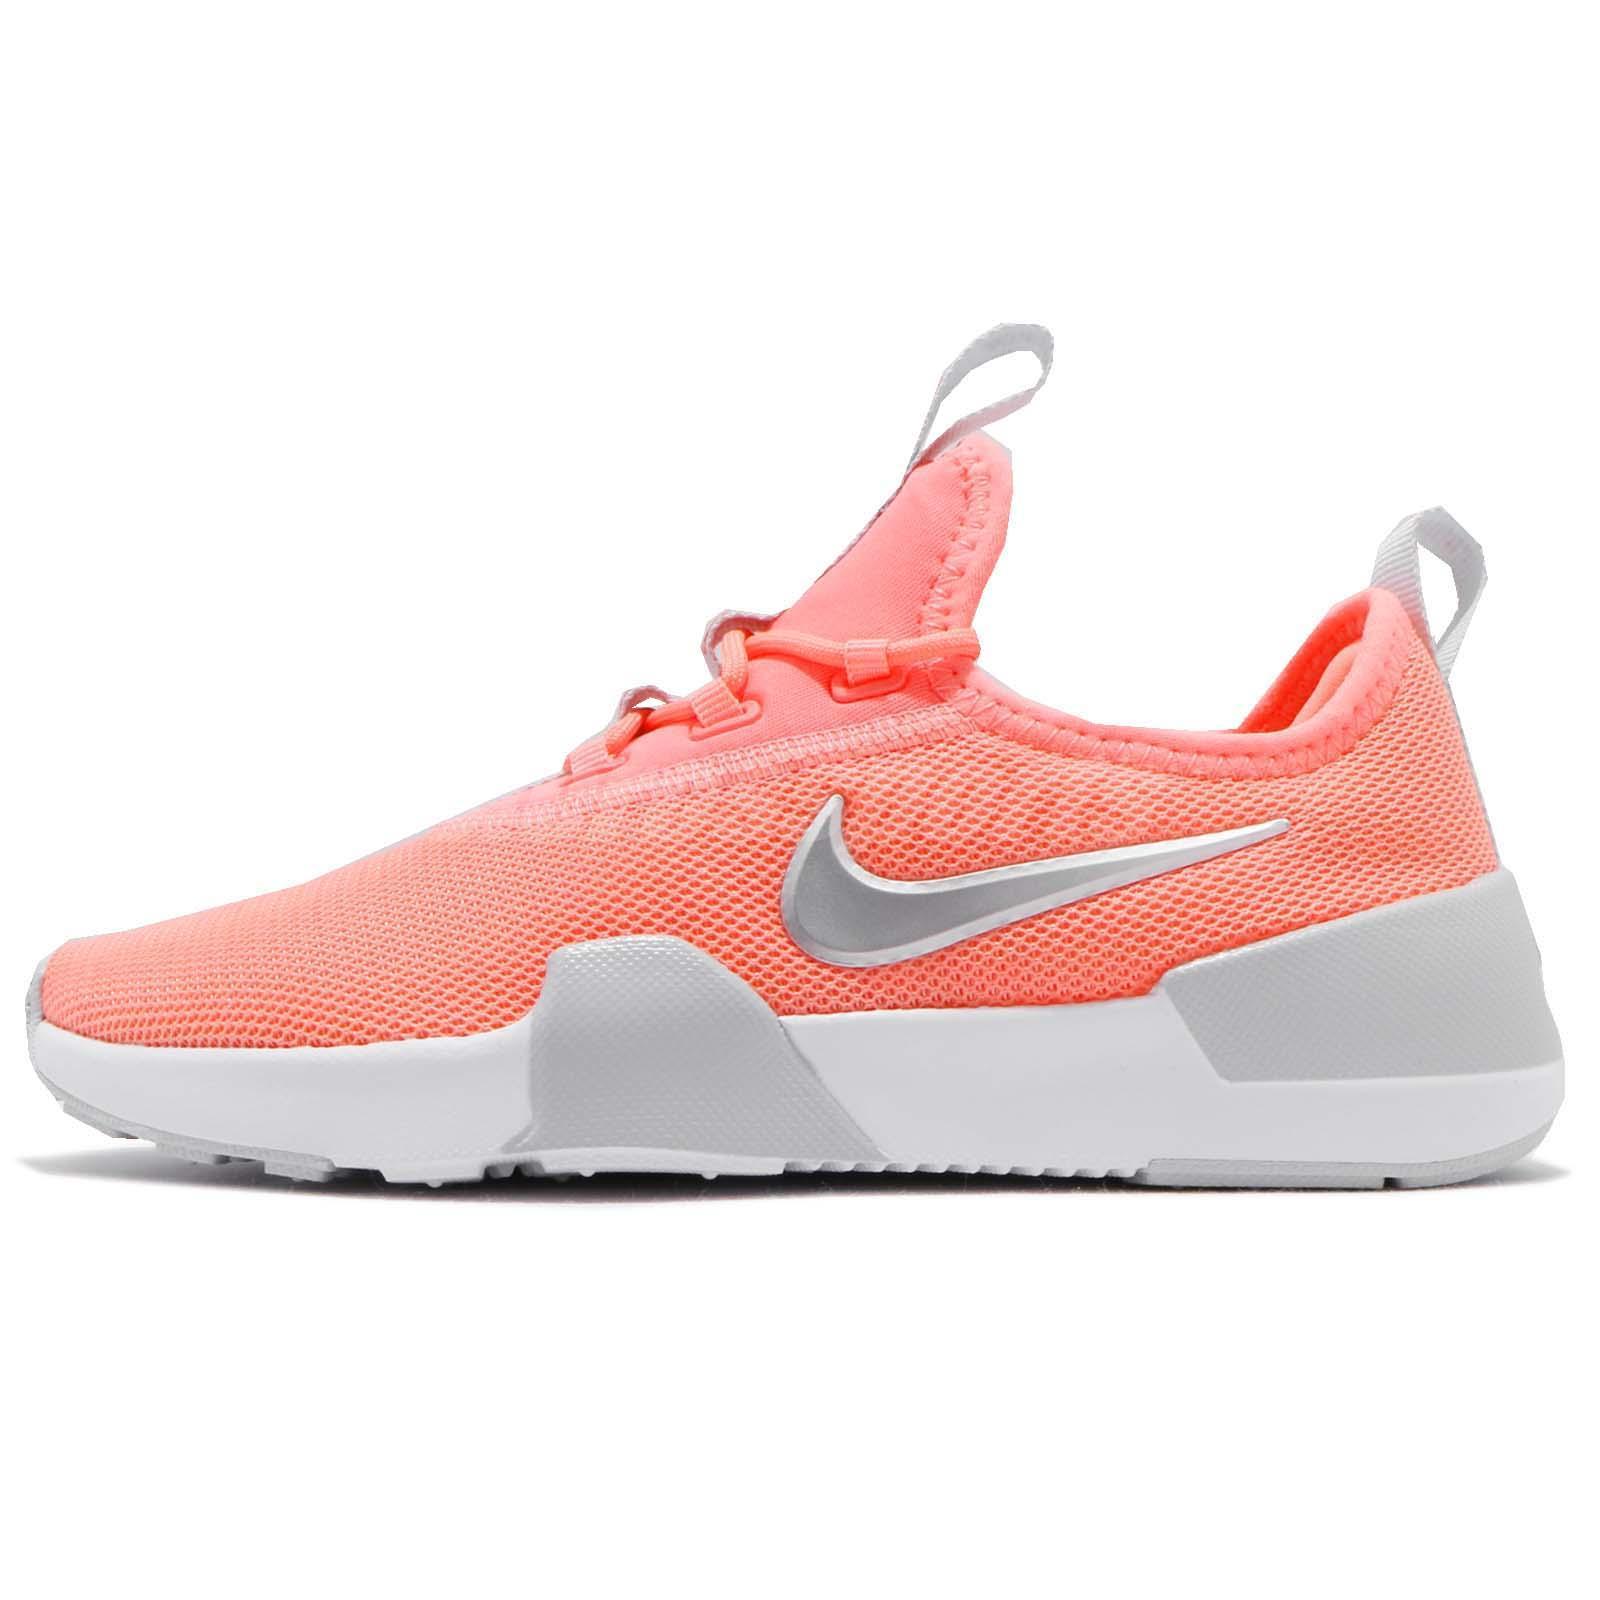 c4b0d17ae0 Nike Ashin Modern PS Pink Silver Preschool Kids Girls Running Shoes  AO1688-600